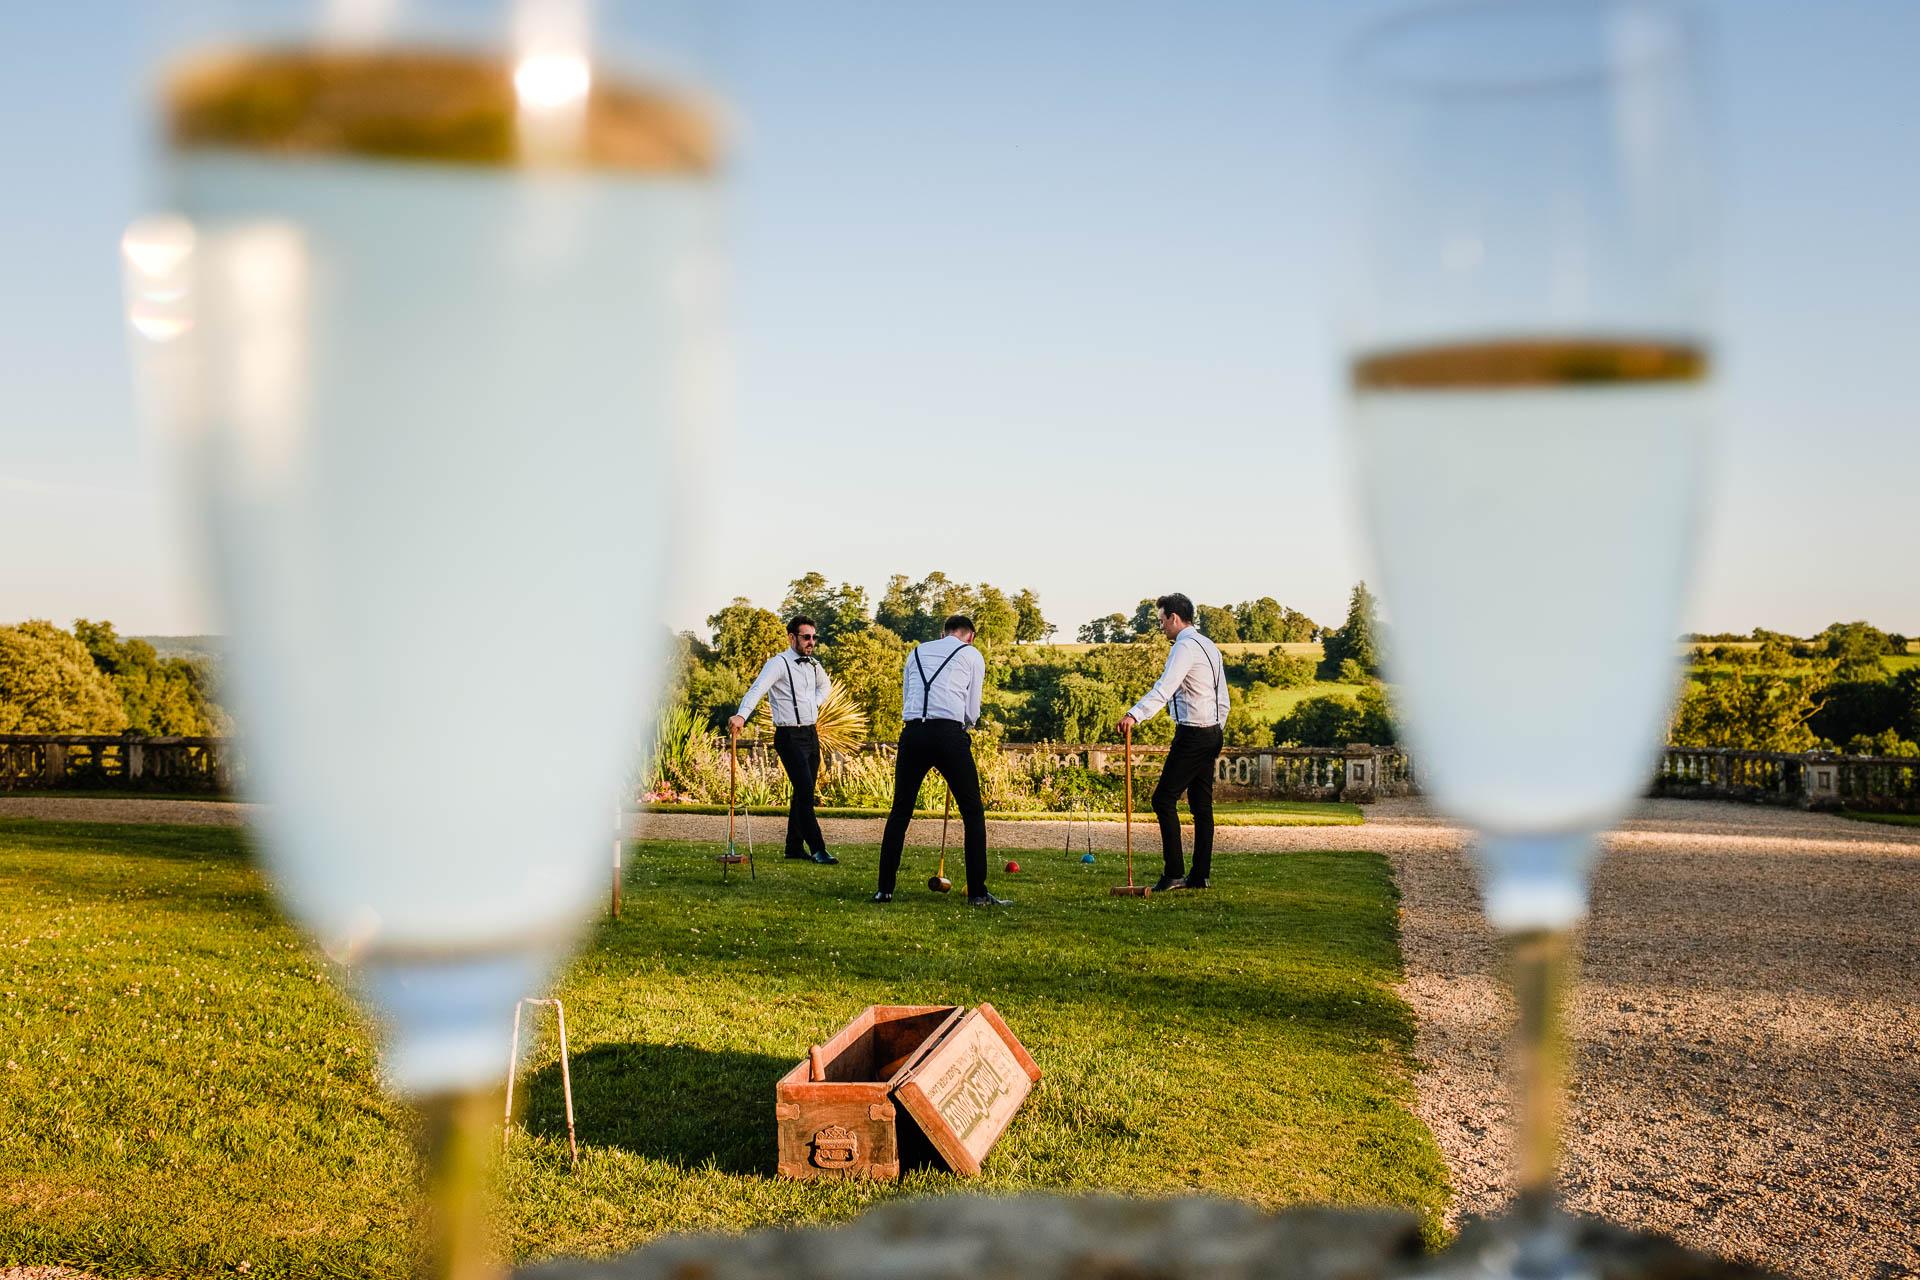 orchardleigh house wedding - Danni & Barney (419).jpg